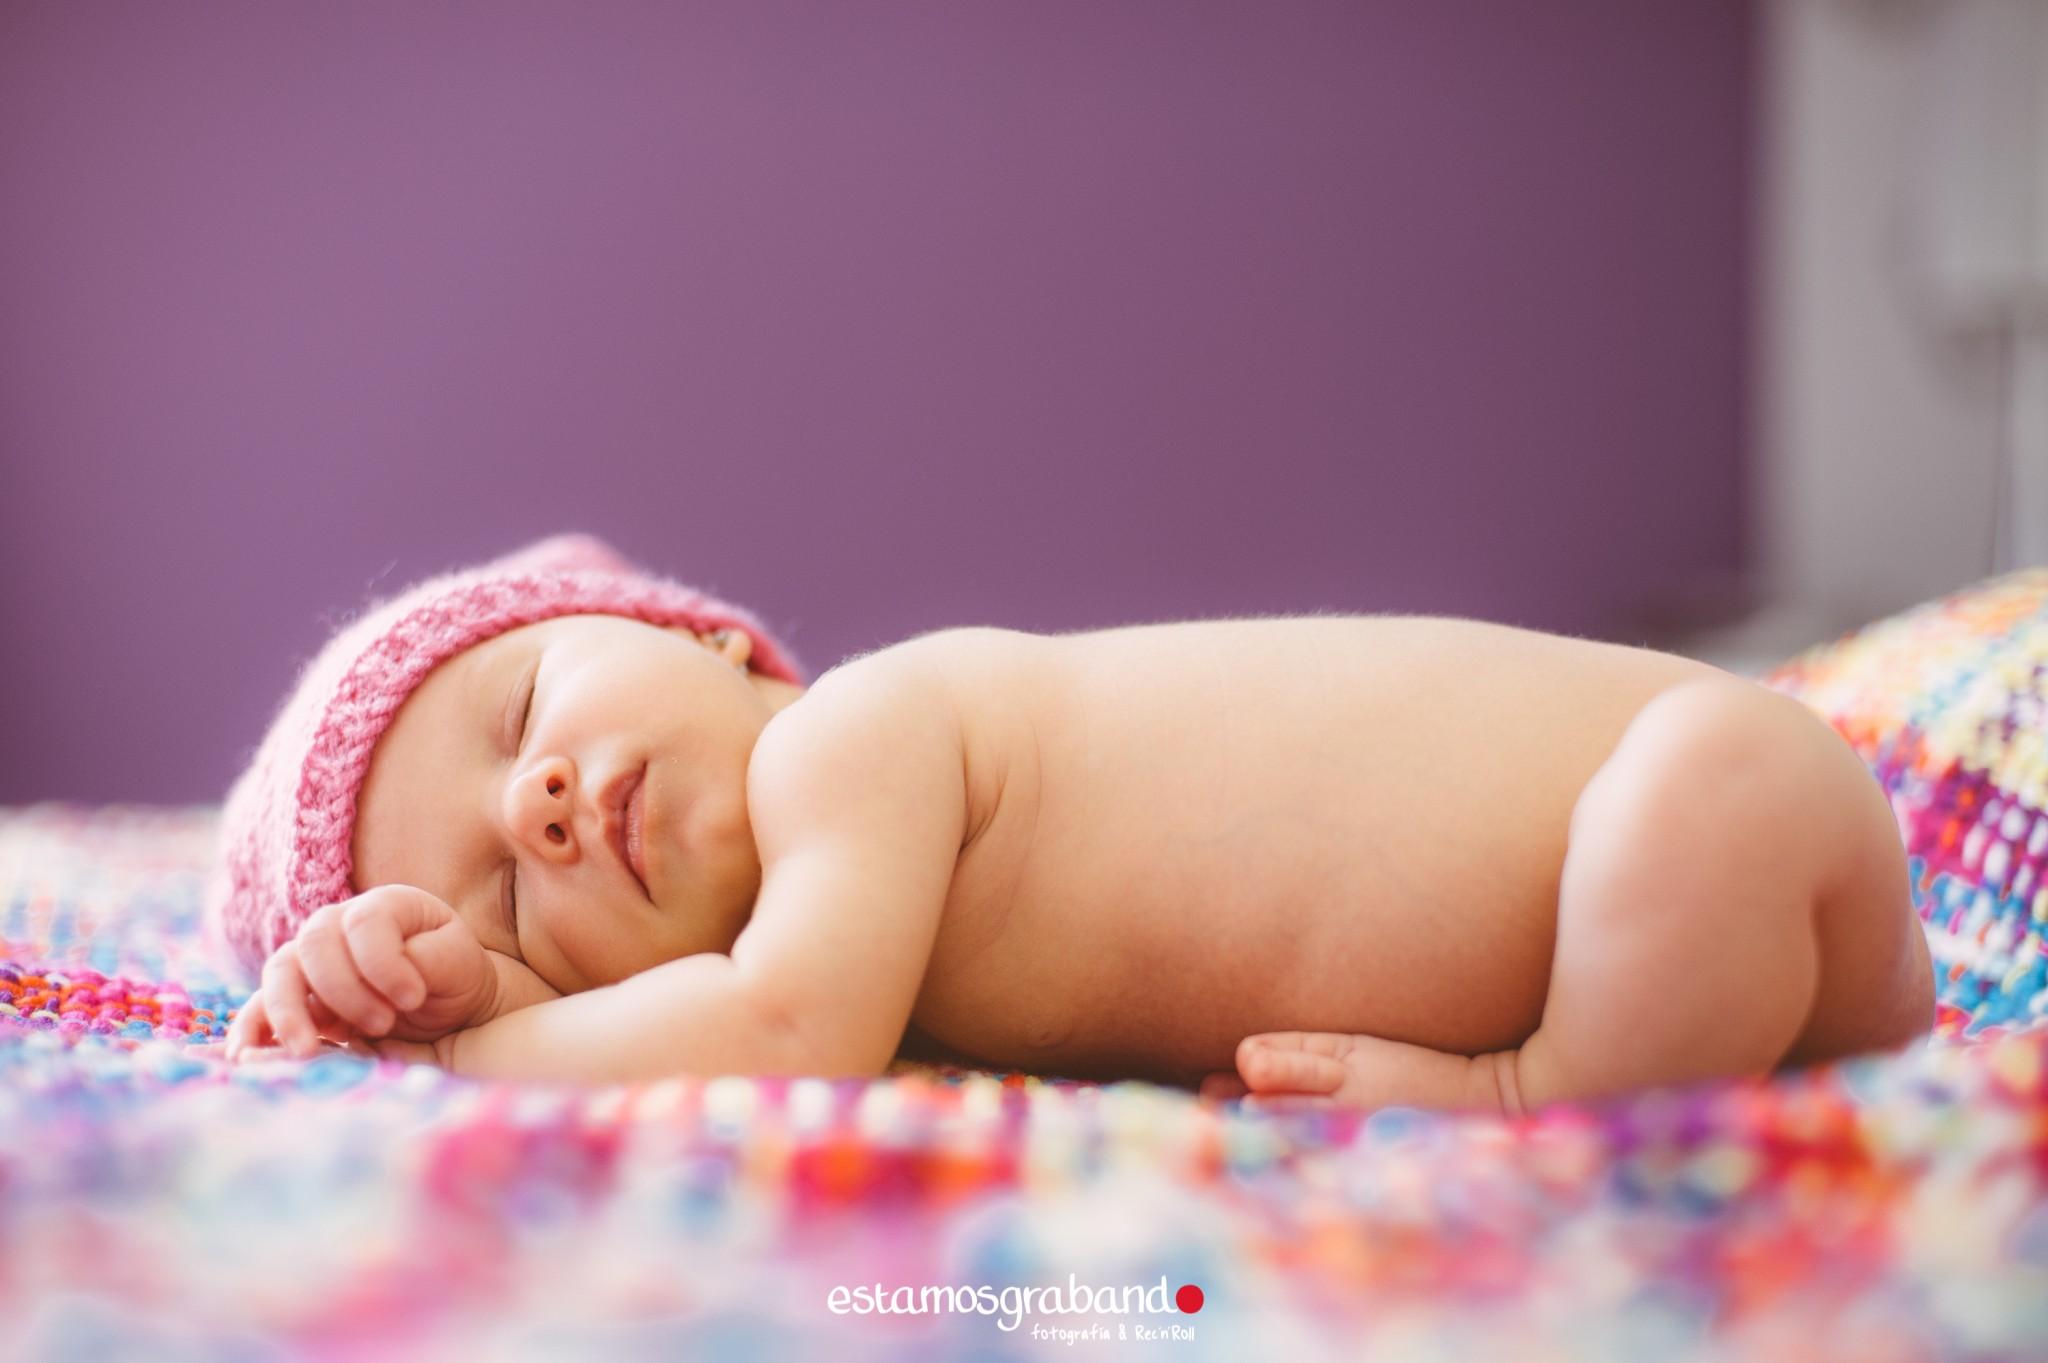 foto-bebe-fotografia-new-born-recien-nacidos-foto-familia-sesion-zahira-15 Zahira, The Baby - video boda cadiz